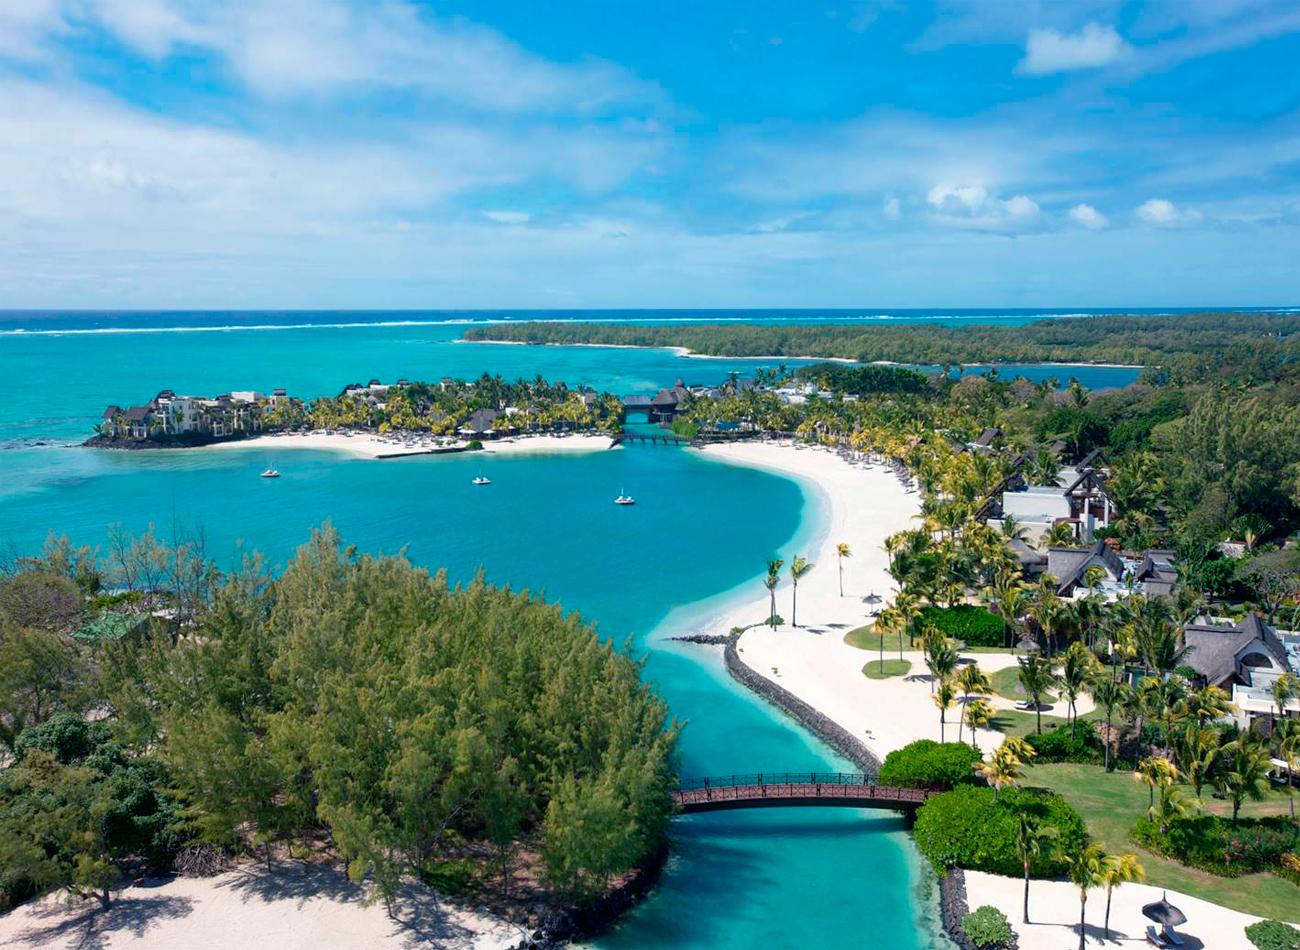 Shangri-La Le Touessrok Resort & Spa 5* Mauritius